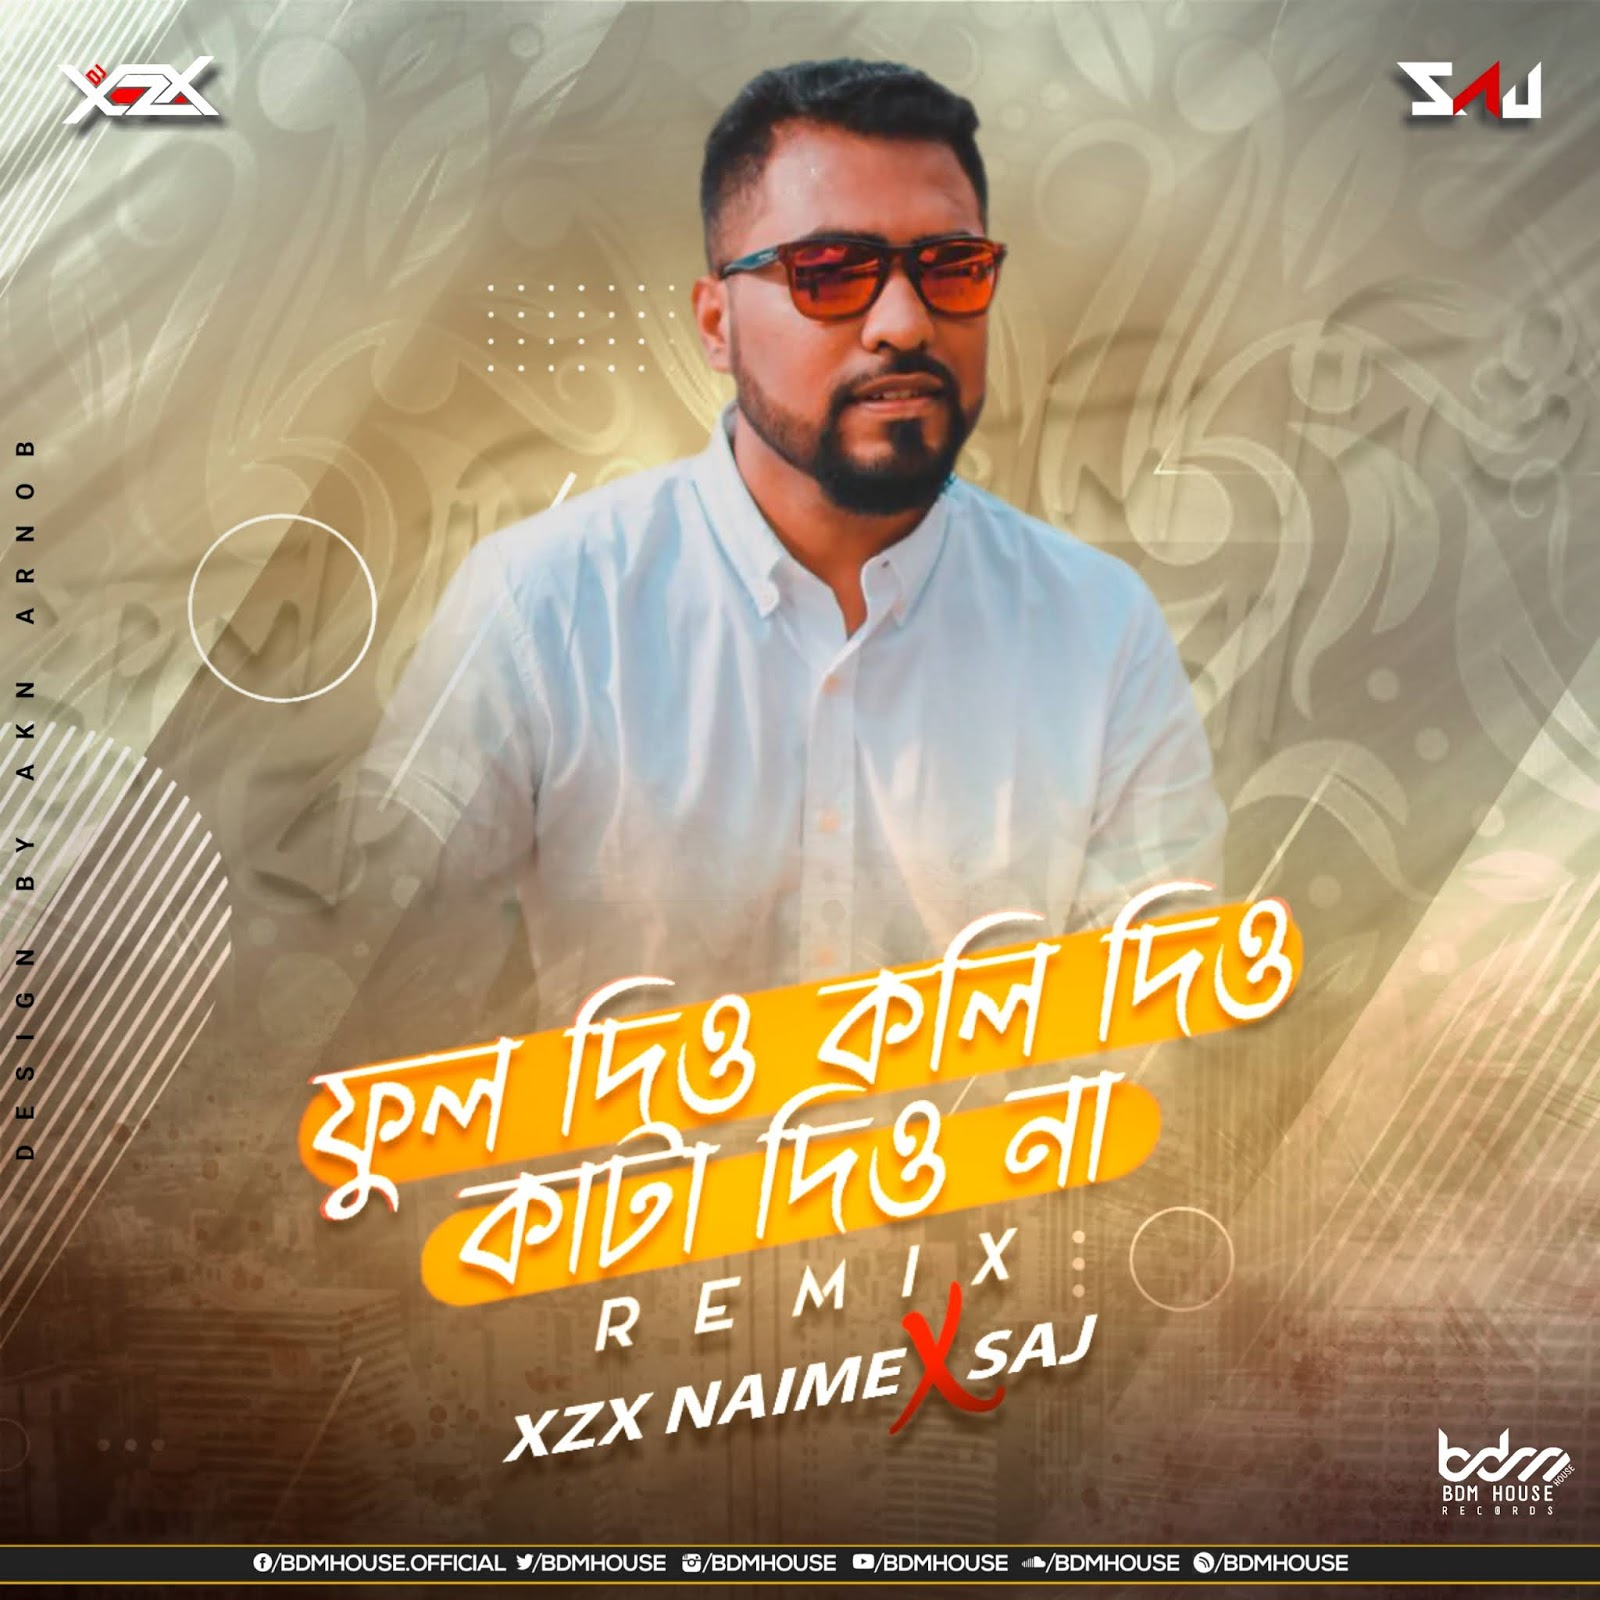 Kamor Diona (Remix) - Xzx Naime & SAJ